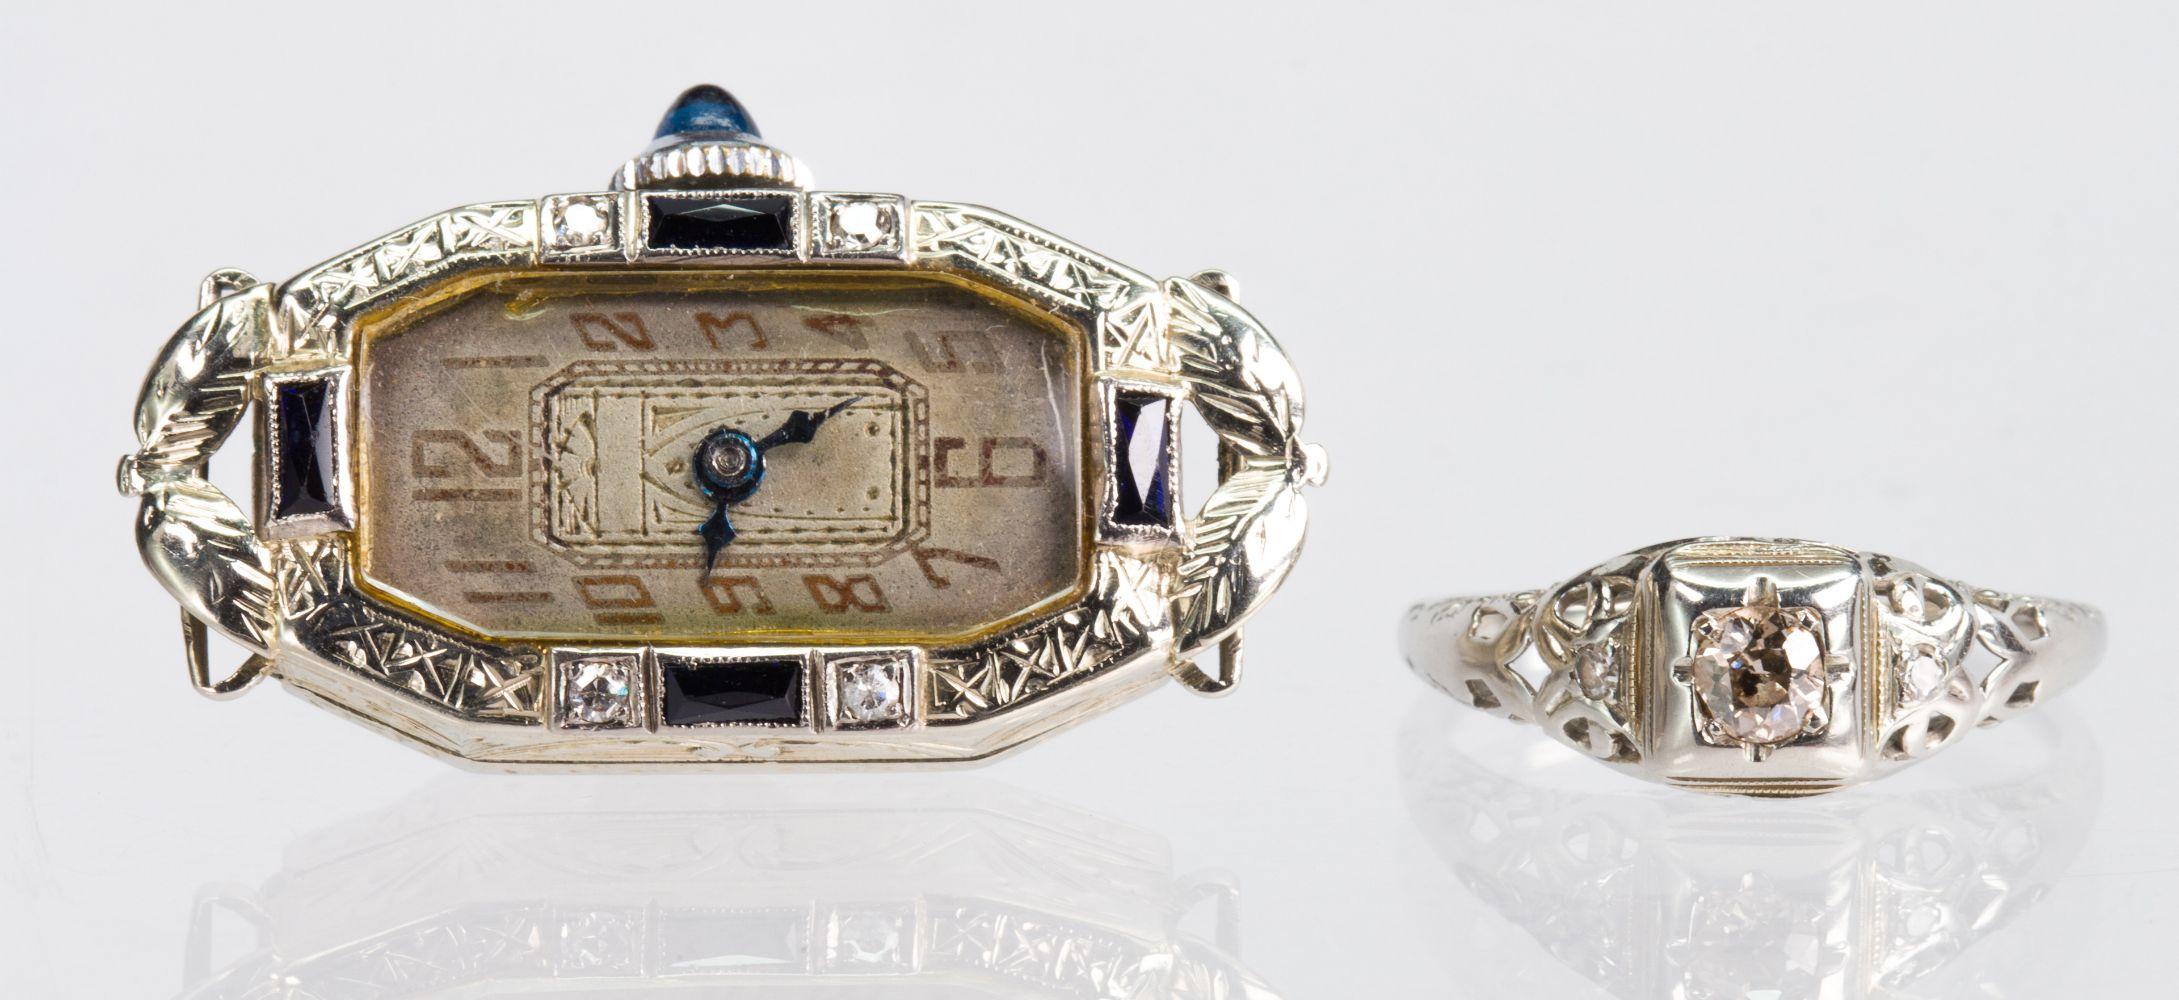 Clars October Fine Art, Furniture, Decoratives, Jewelery, and Asian Art Auction